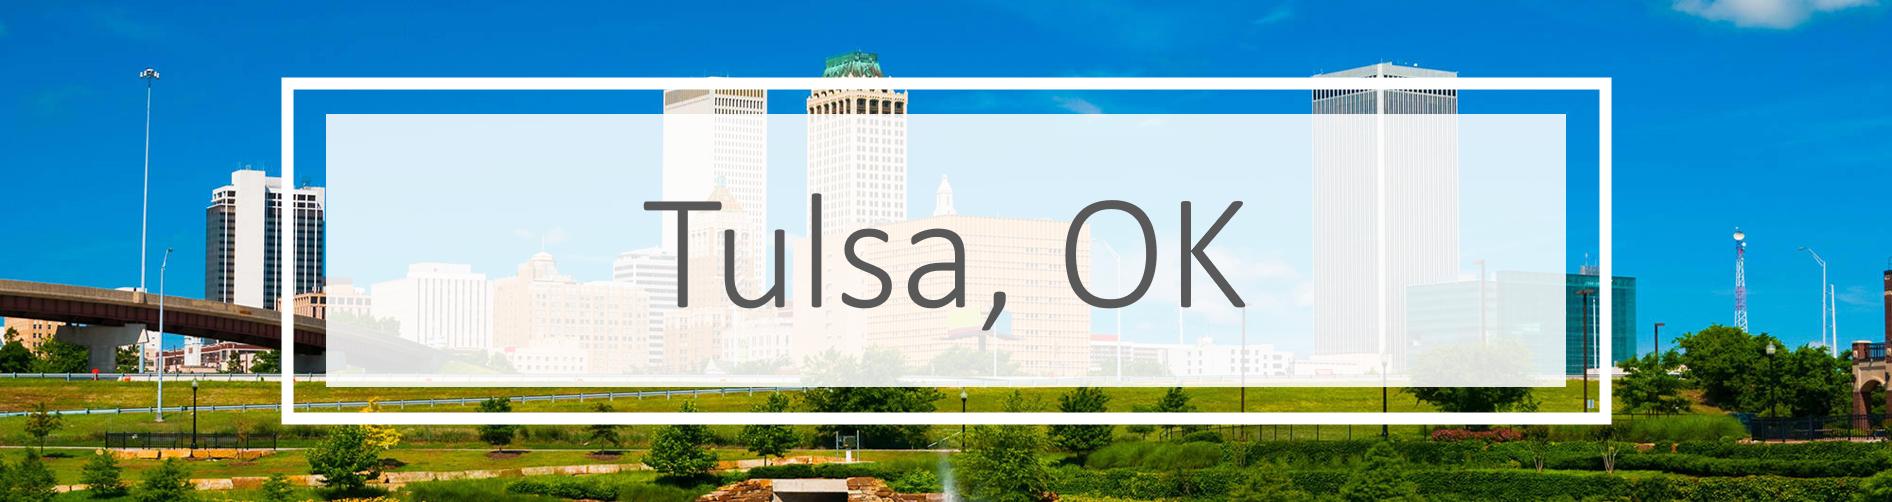 Kia Dealership in Tulsa, OK